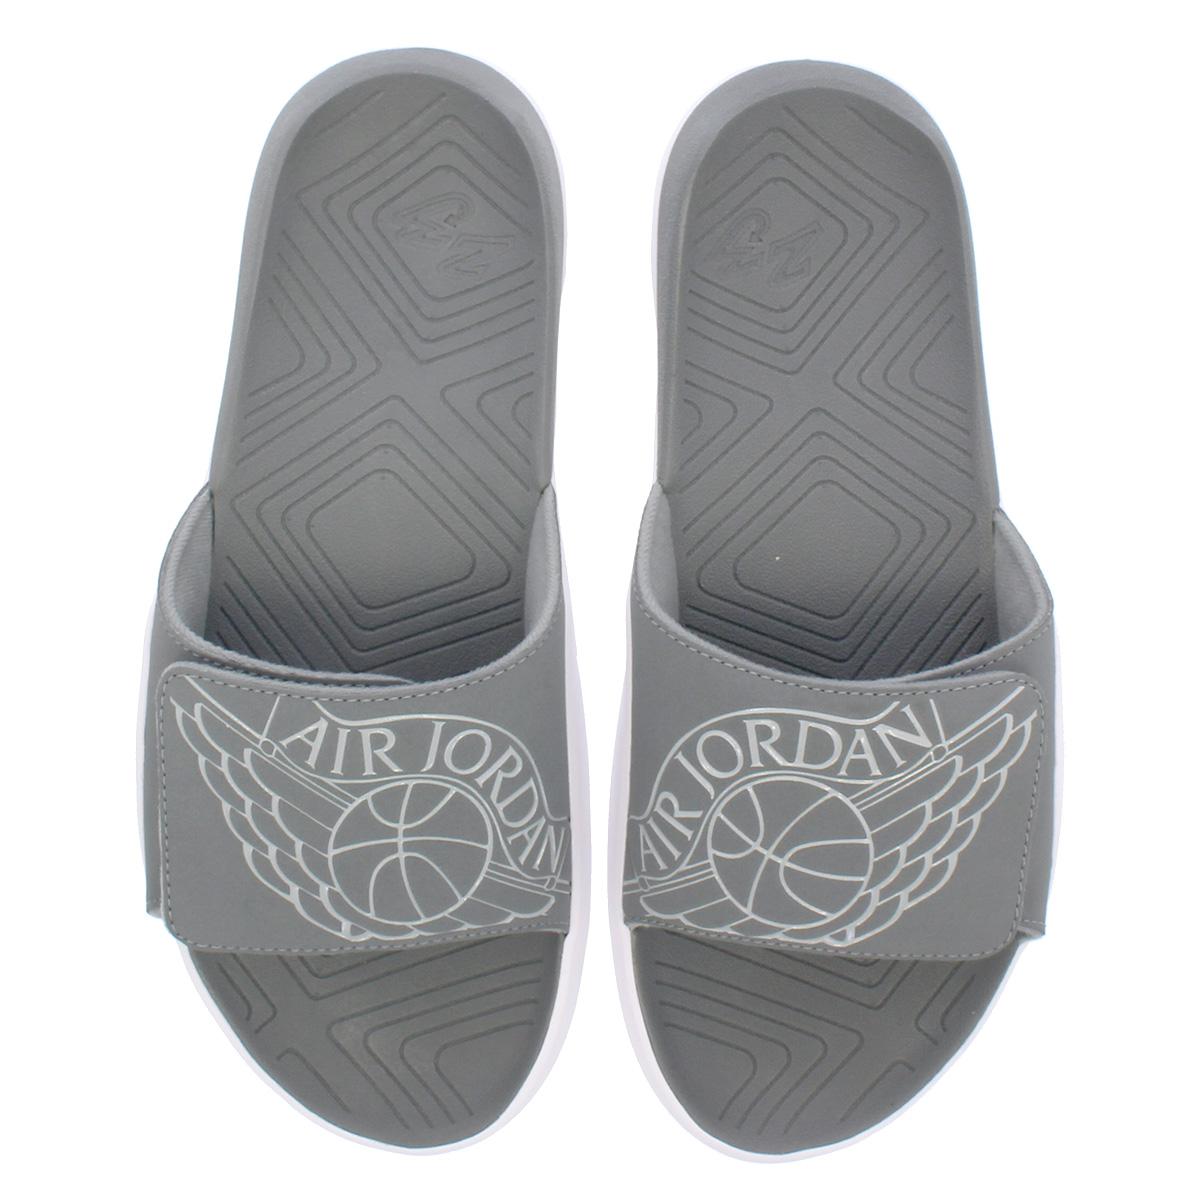 735049ce6631 NIKE JORDAN HYDRO 7 Nike Jordan high mud 7 SMOKE GREY PARTICLE GREY WHITE  aa2517-002